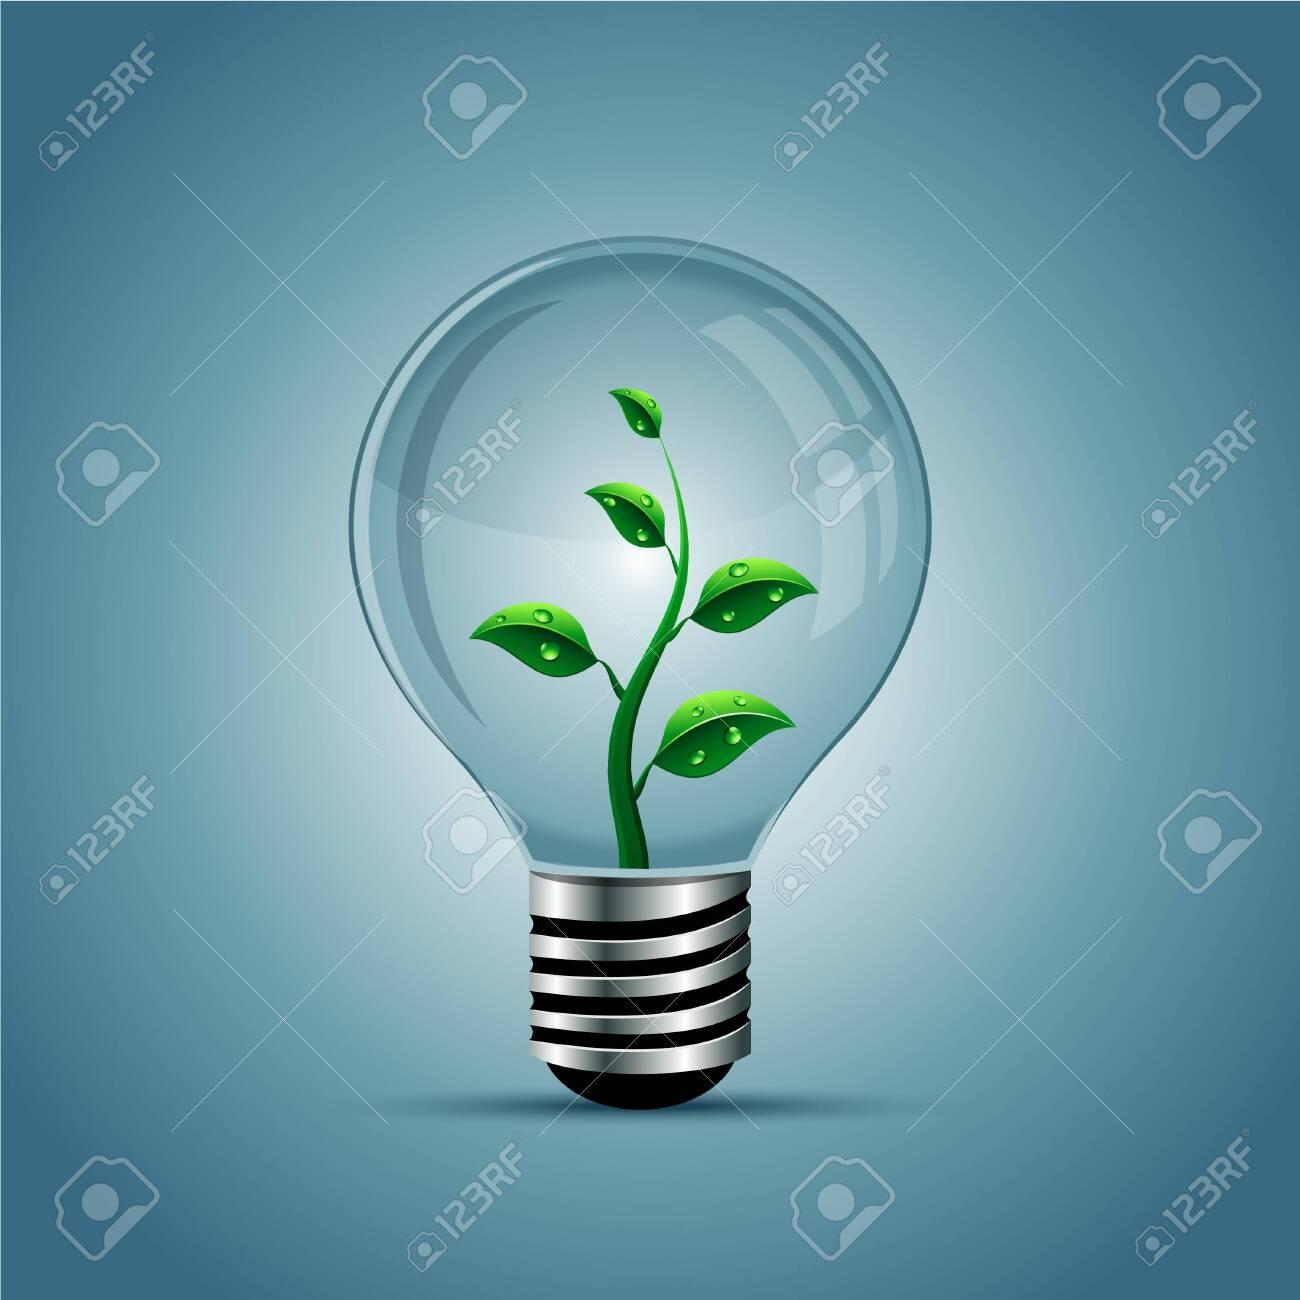 Vector light bulb, eco concept - 150611415